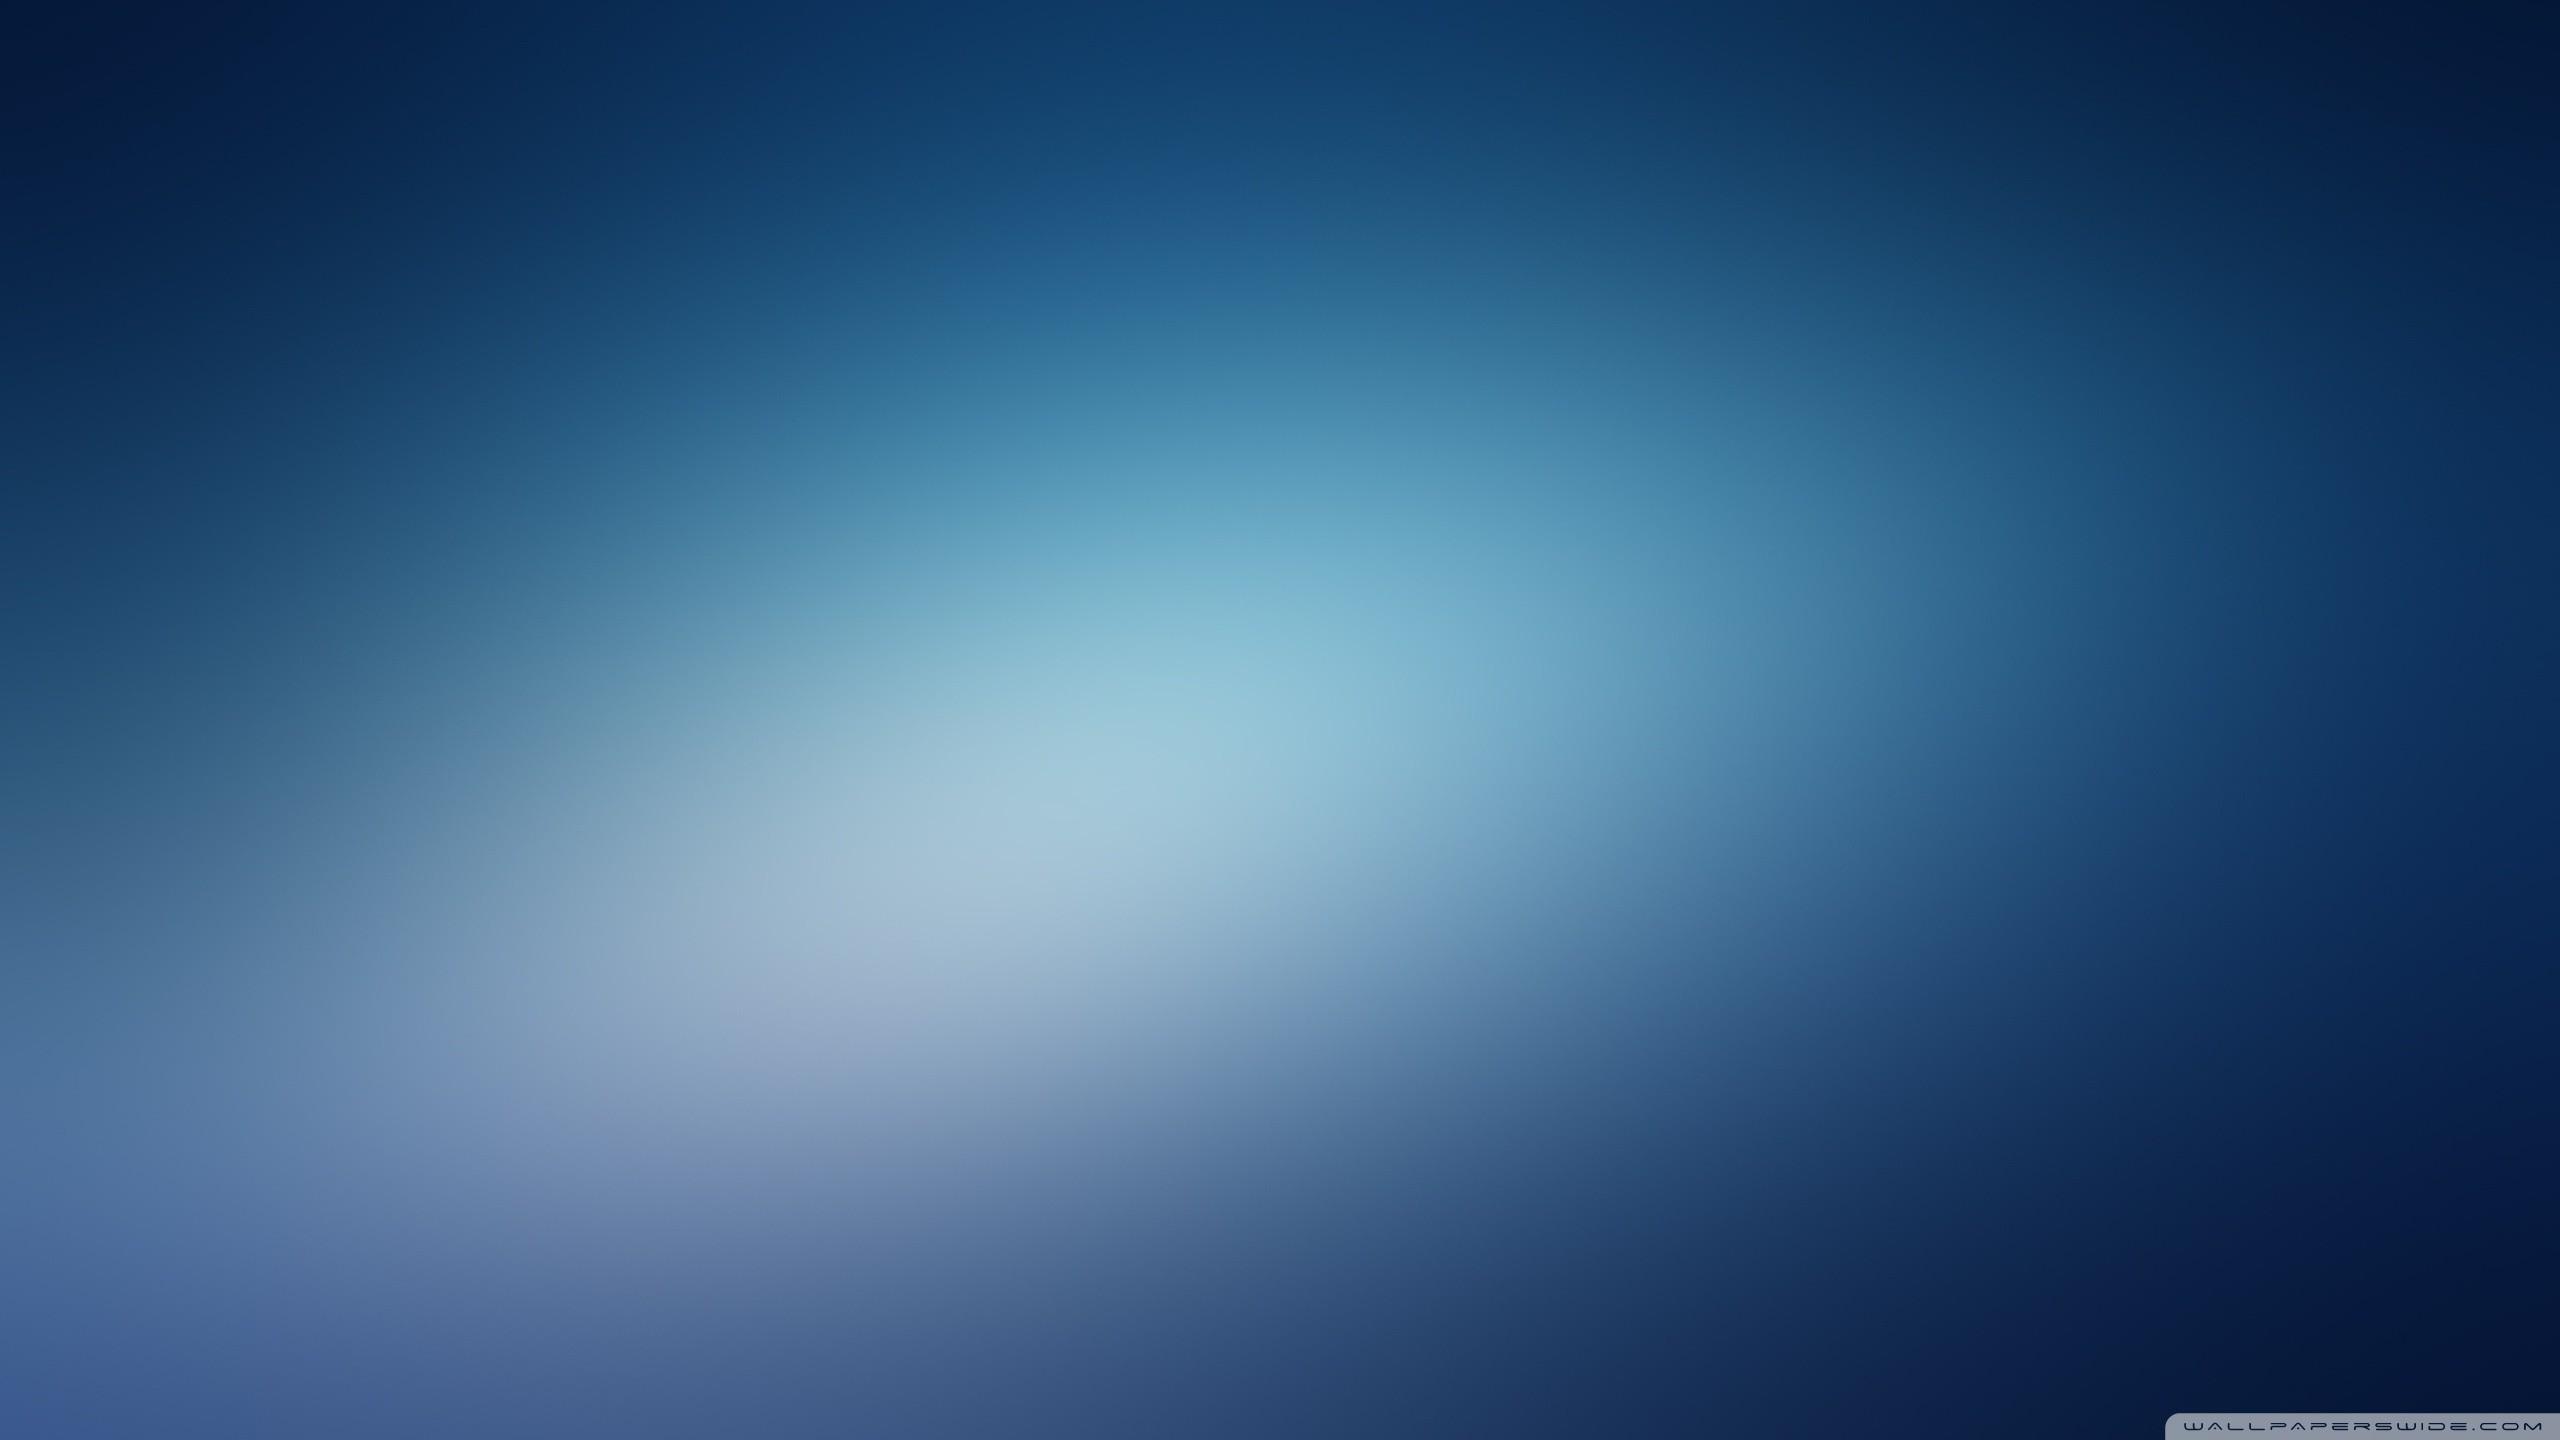 Professional Blue Background fond ecran hd